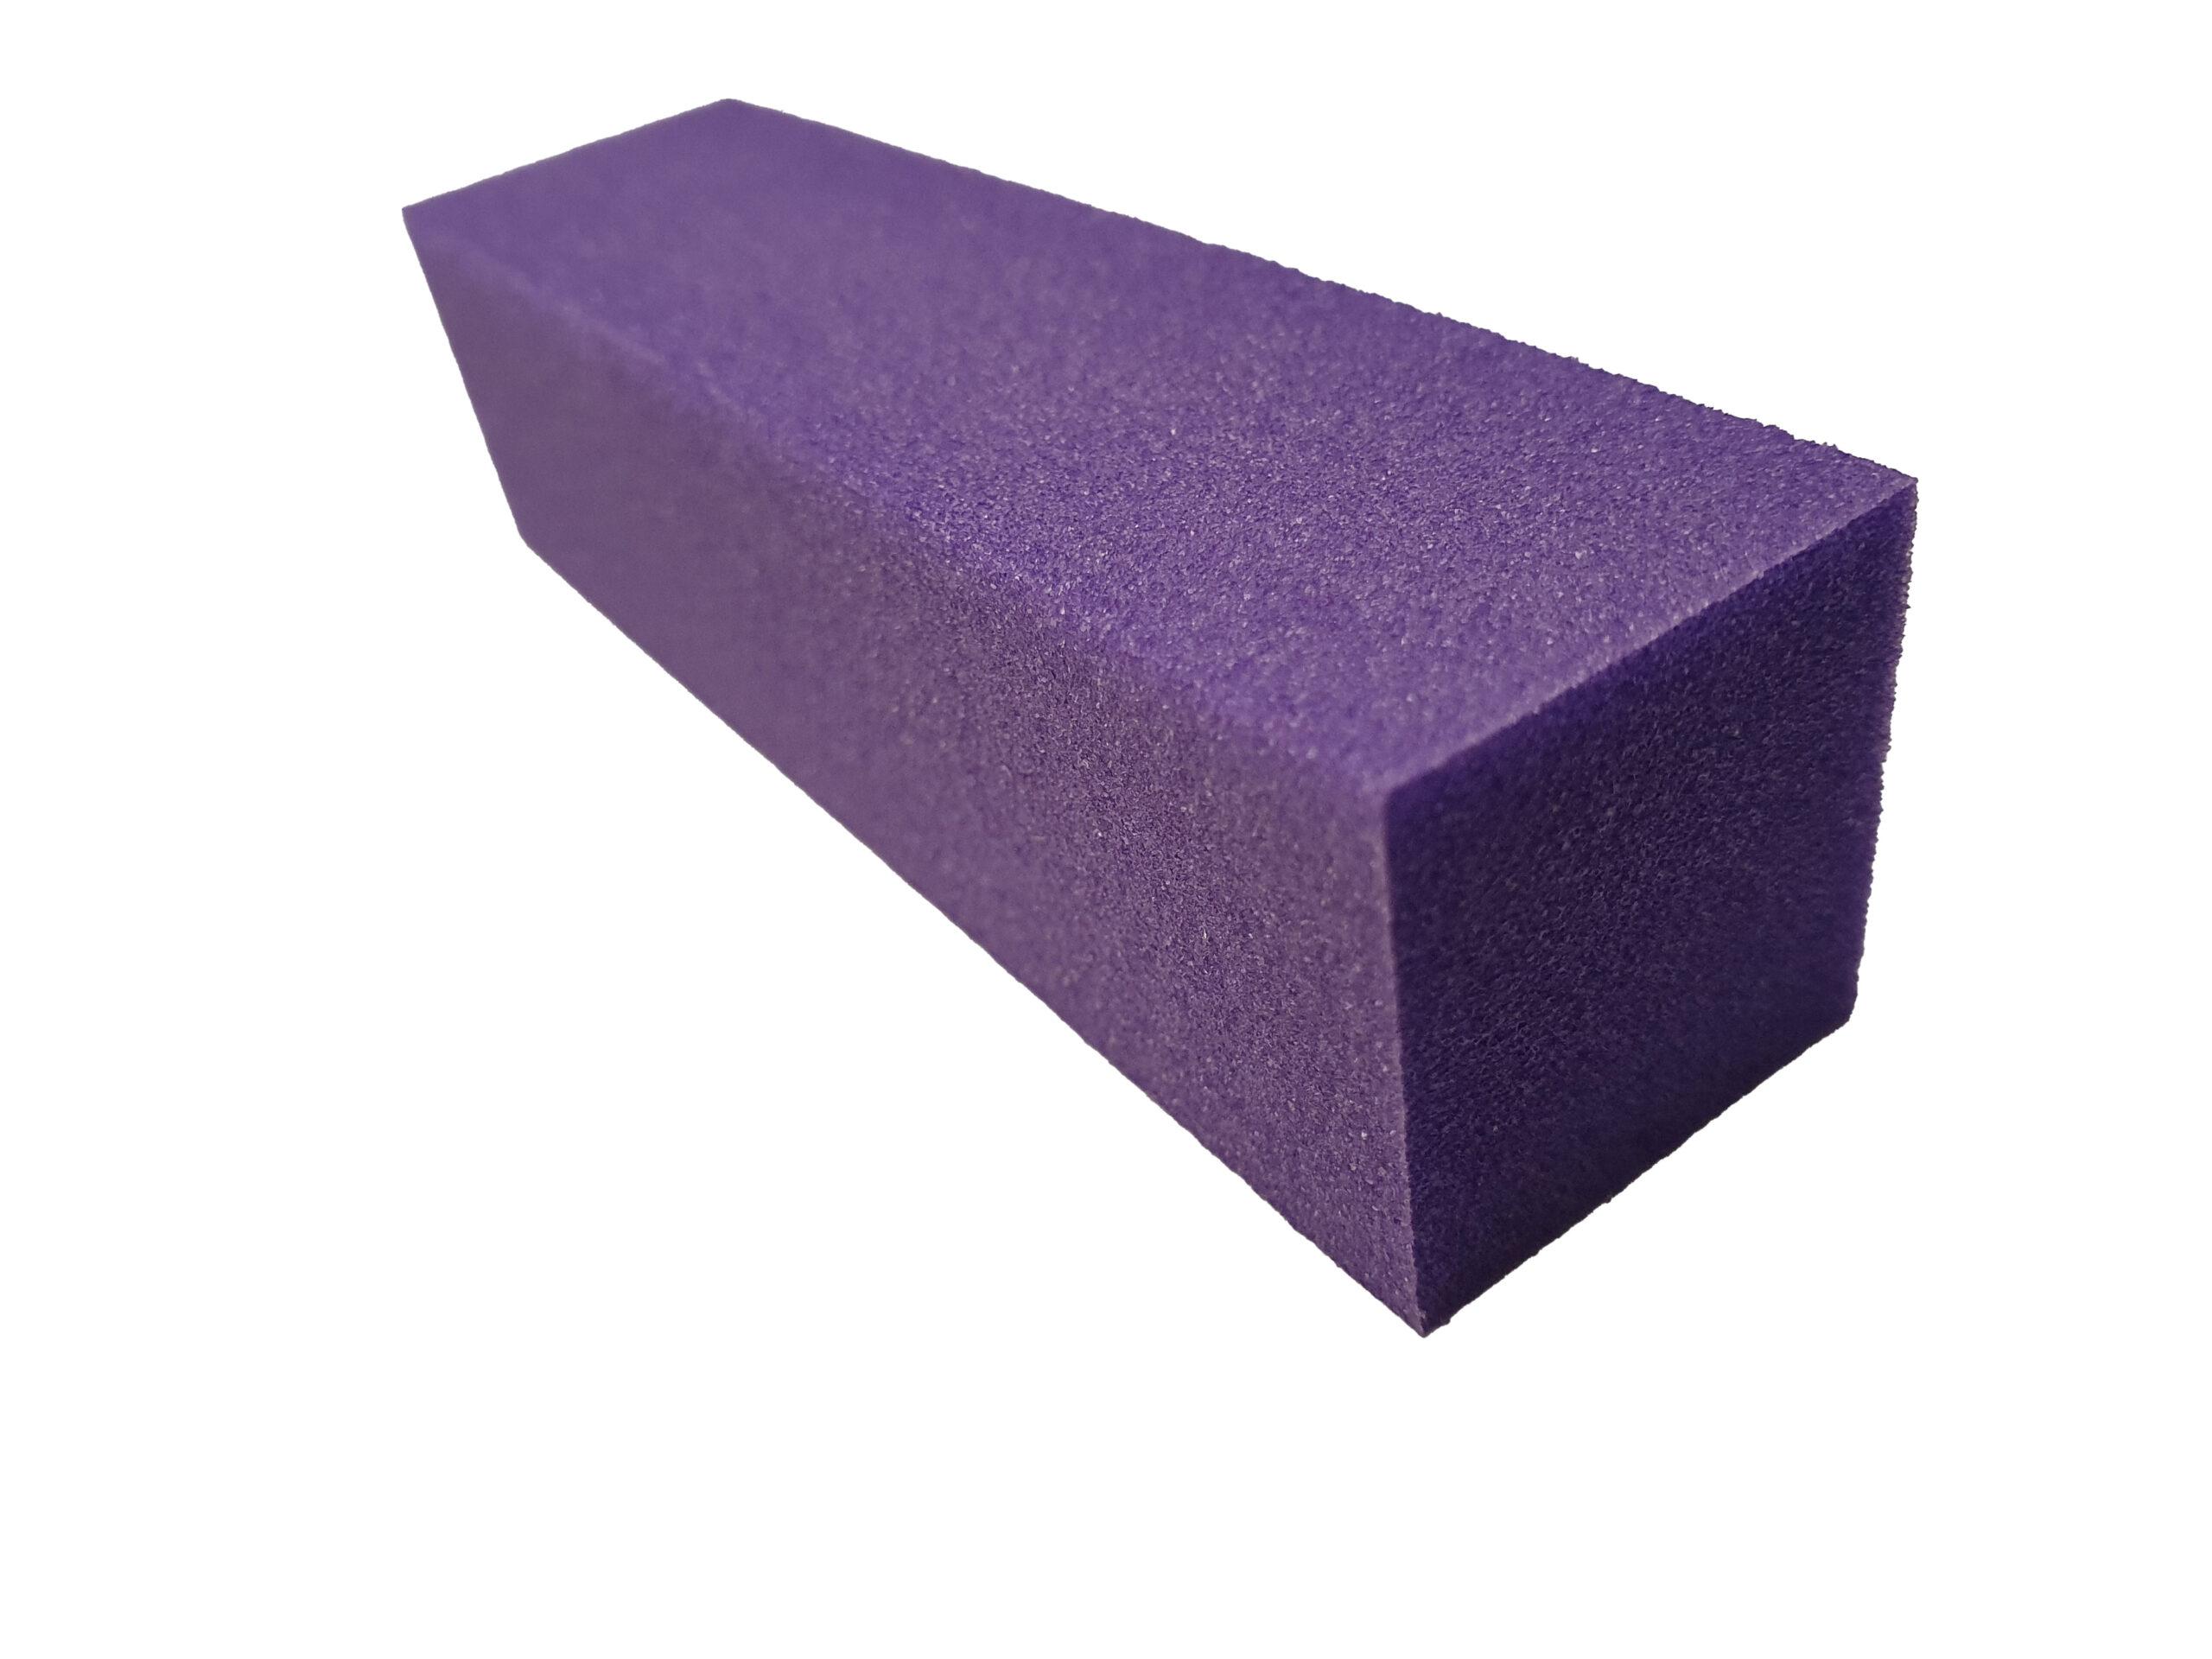 Blok Pastelowy Fioletowy 100/100